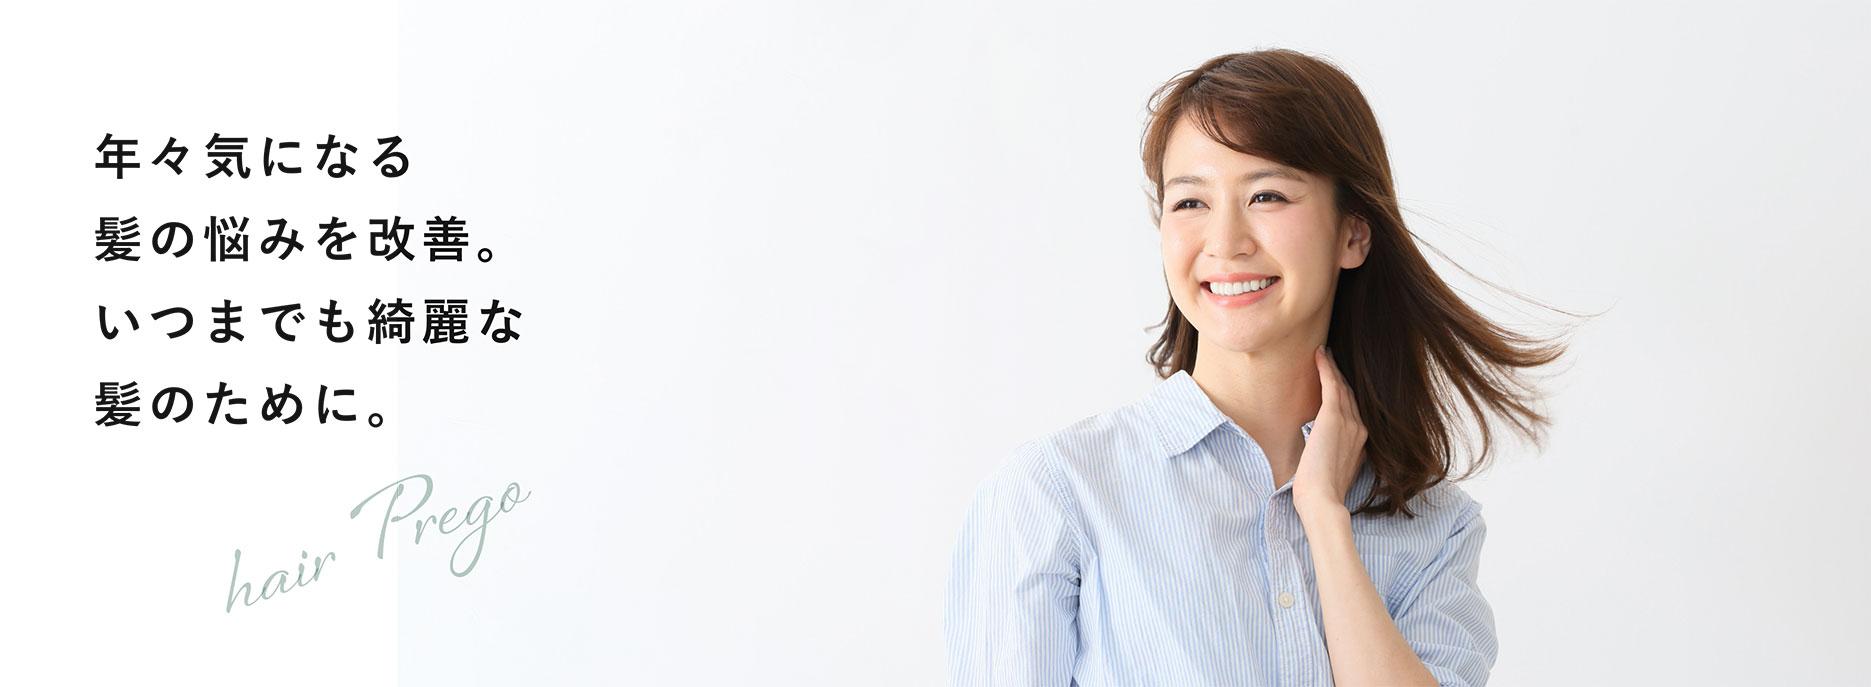 hair prego(ヘアープレゴ) 清澄白河 東陽町 美容院(美容室)